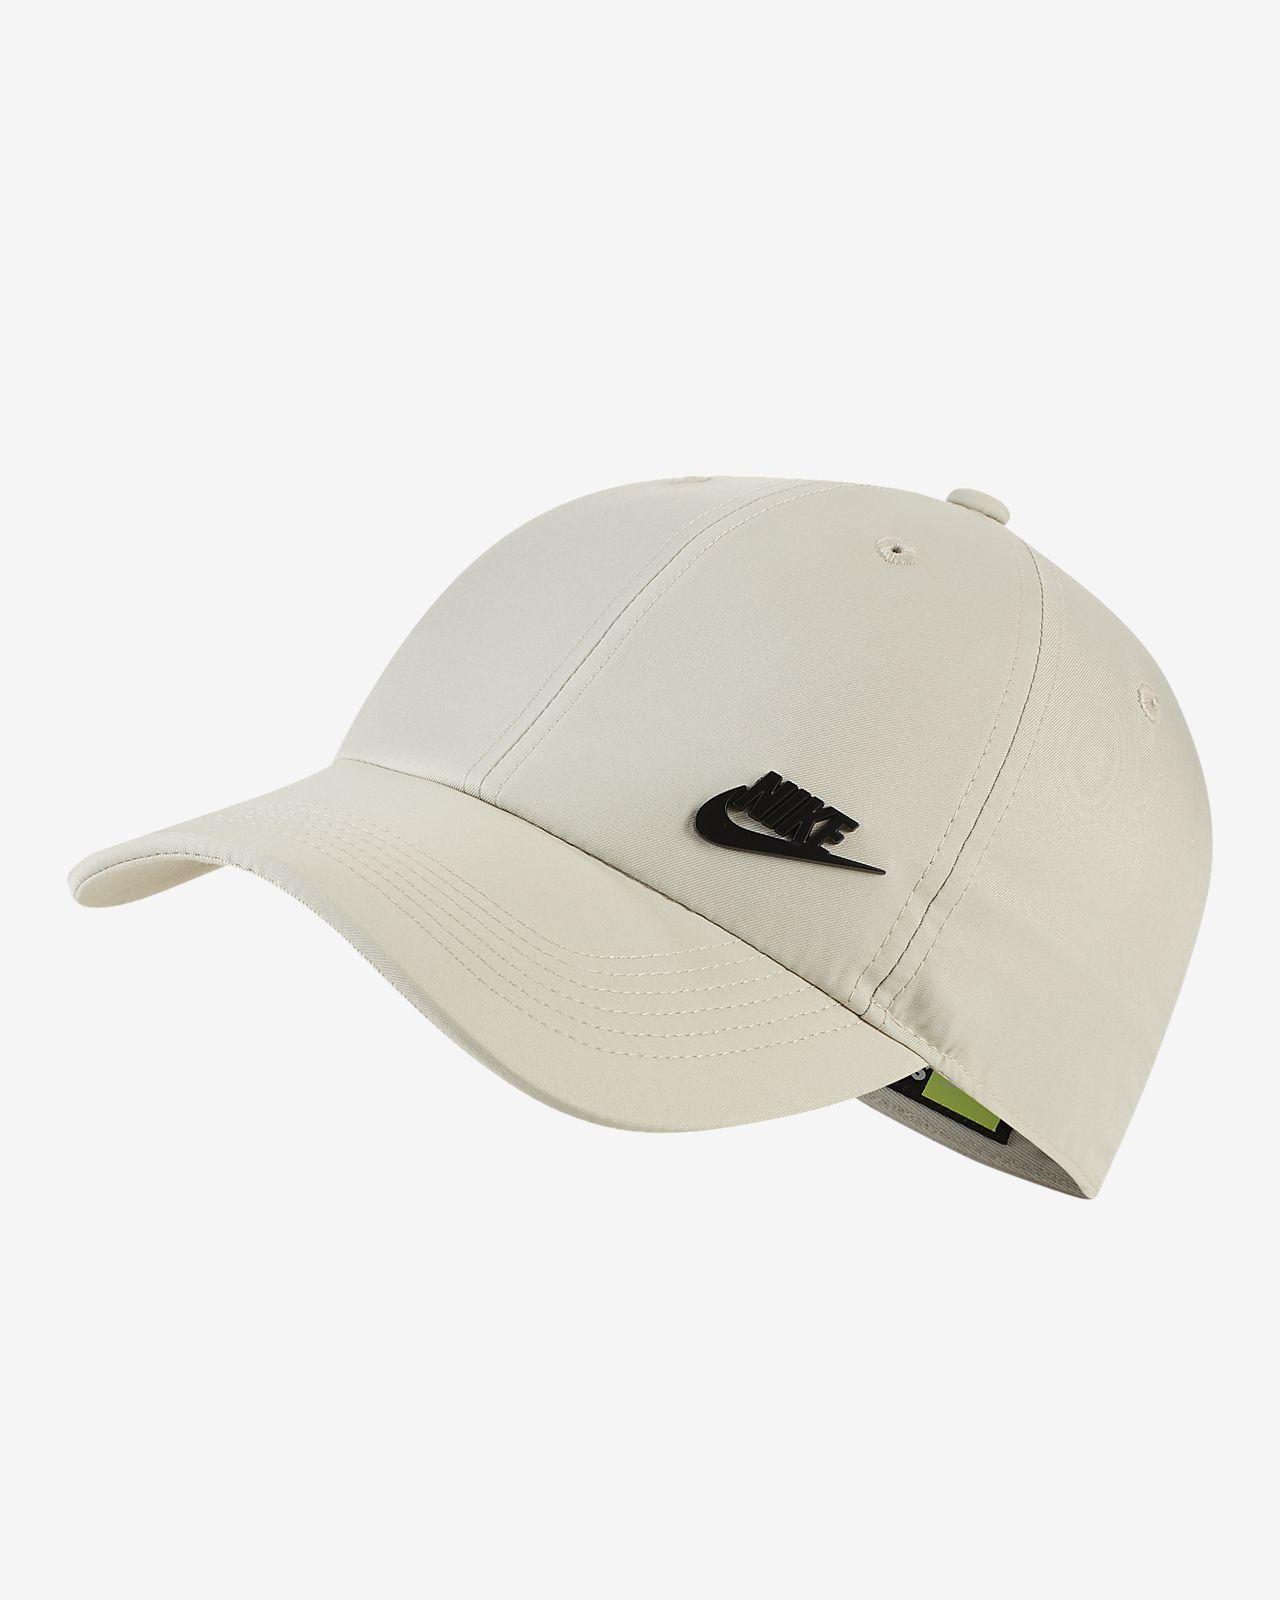 Nike Sportswear Futura Heritage 86 Adjustable Hat